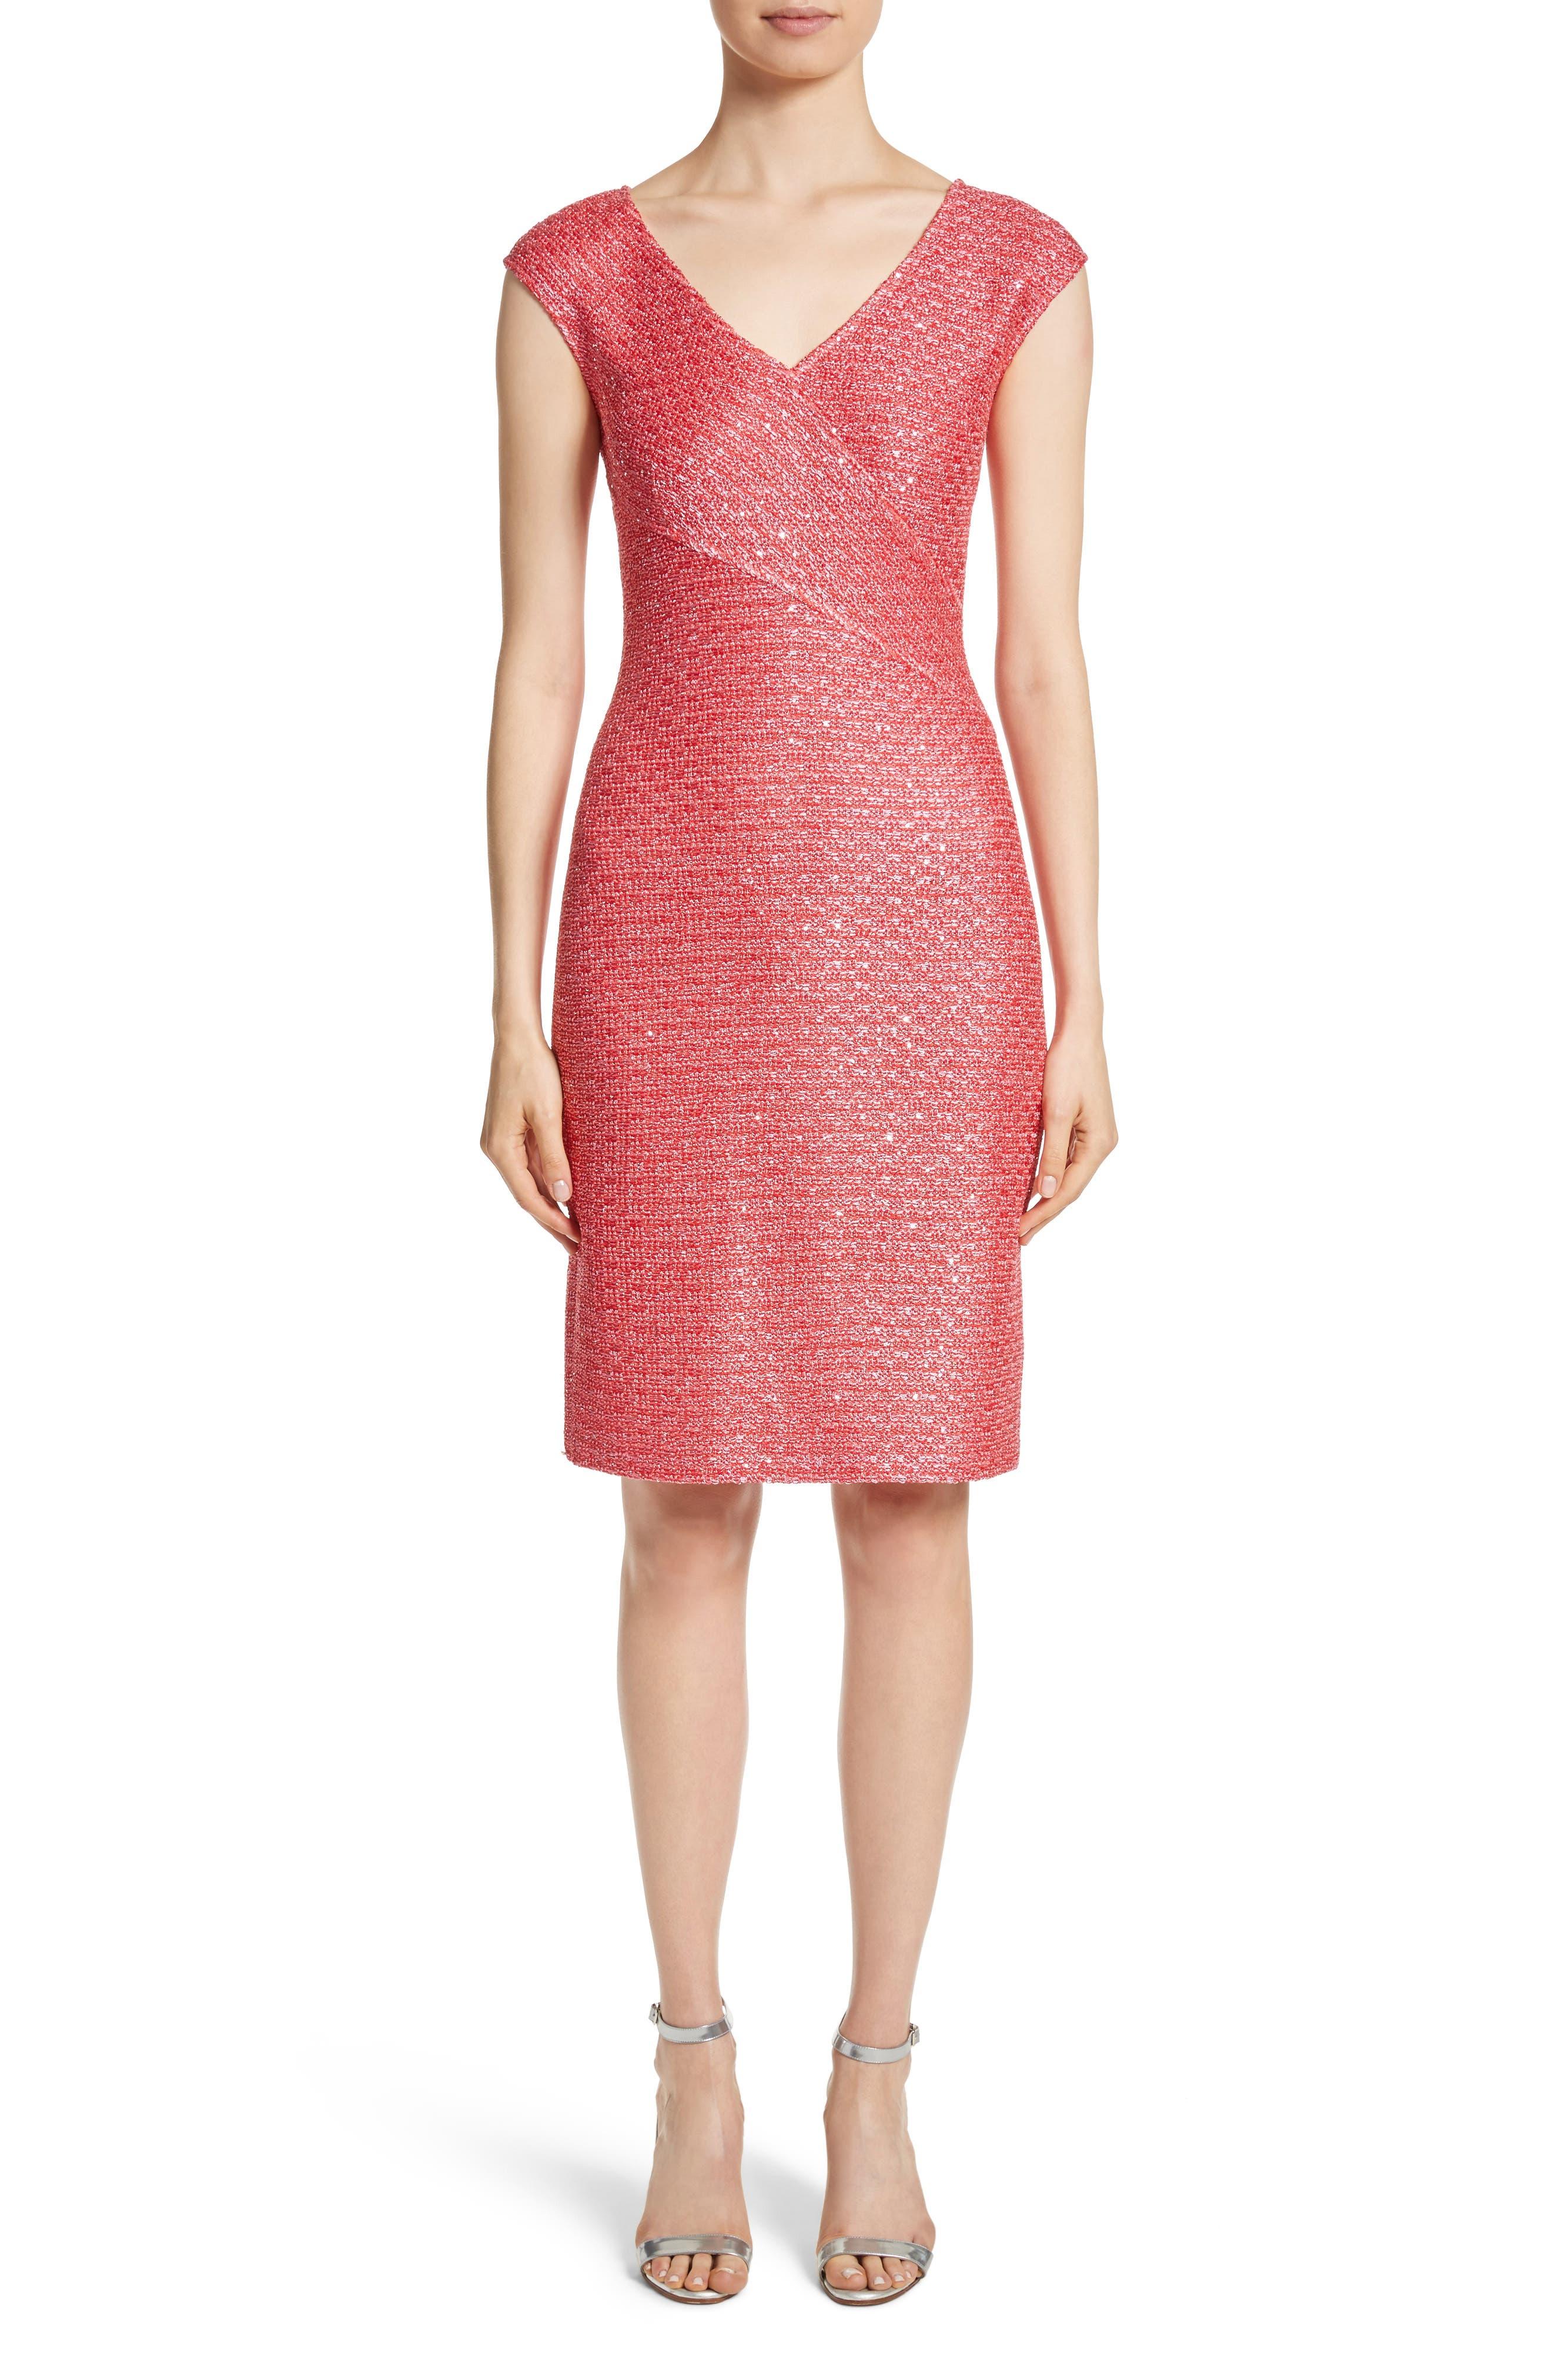 ST. JOHN COLLECTION,                             Hansh Knit Dress,                             Main thumbnail 1, color,                             950